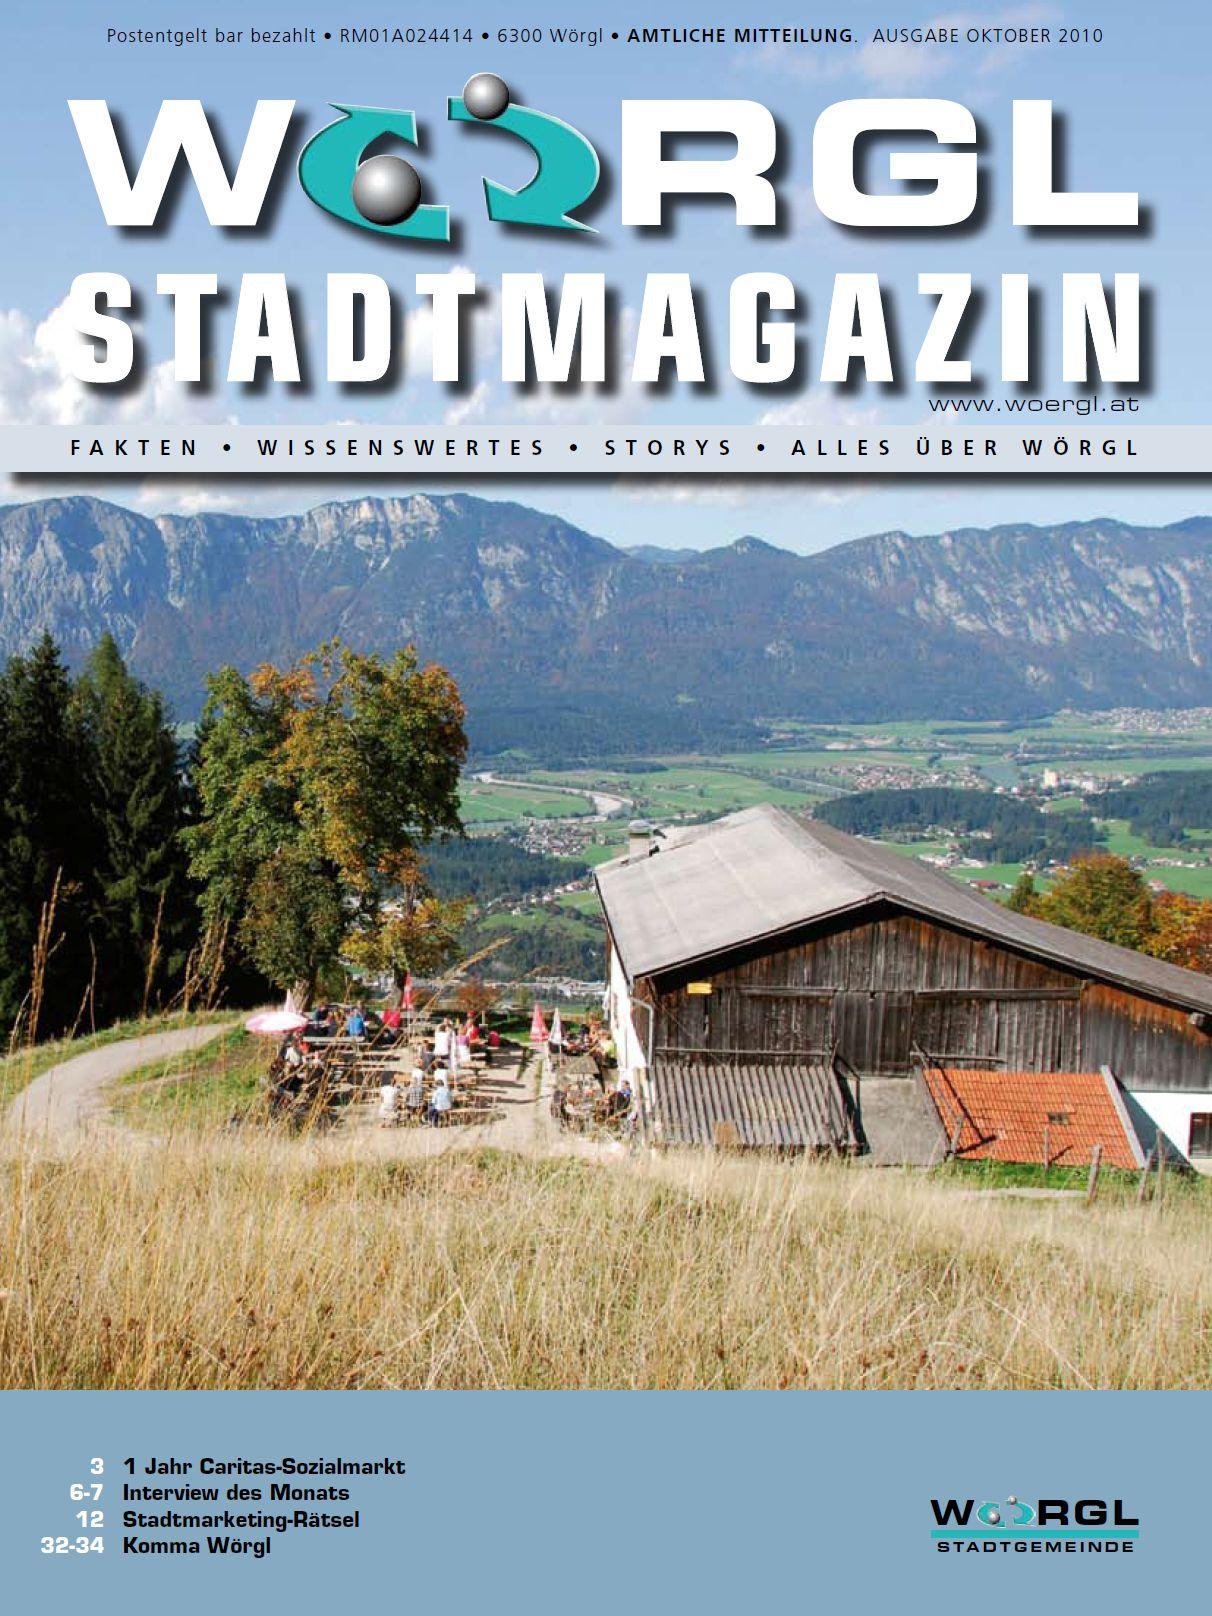 Wörgler Stadtmagazin Oktober 2010